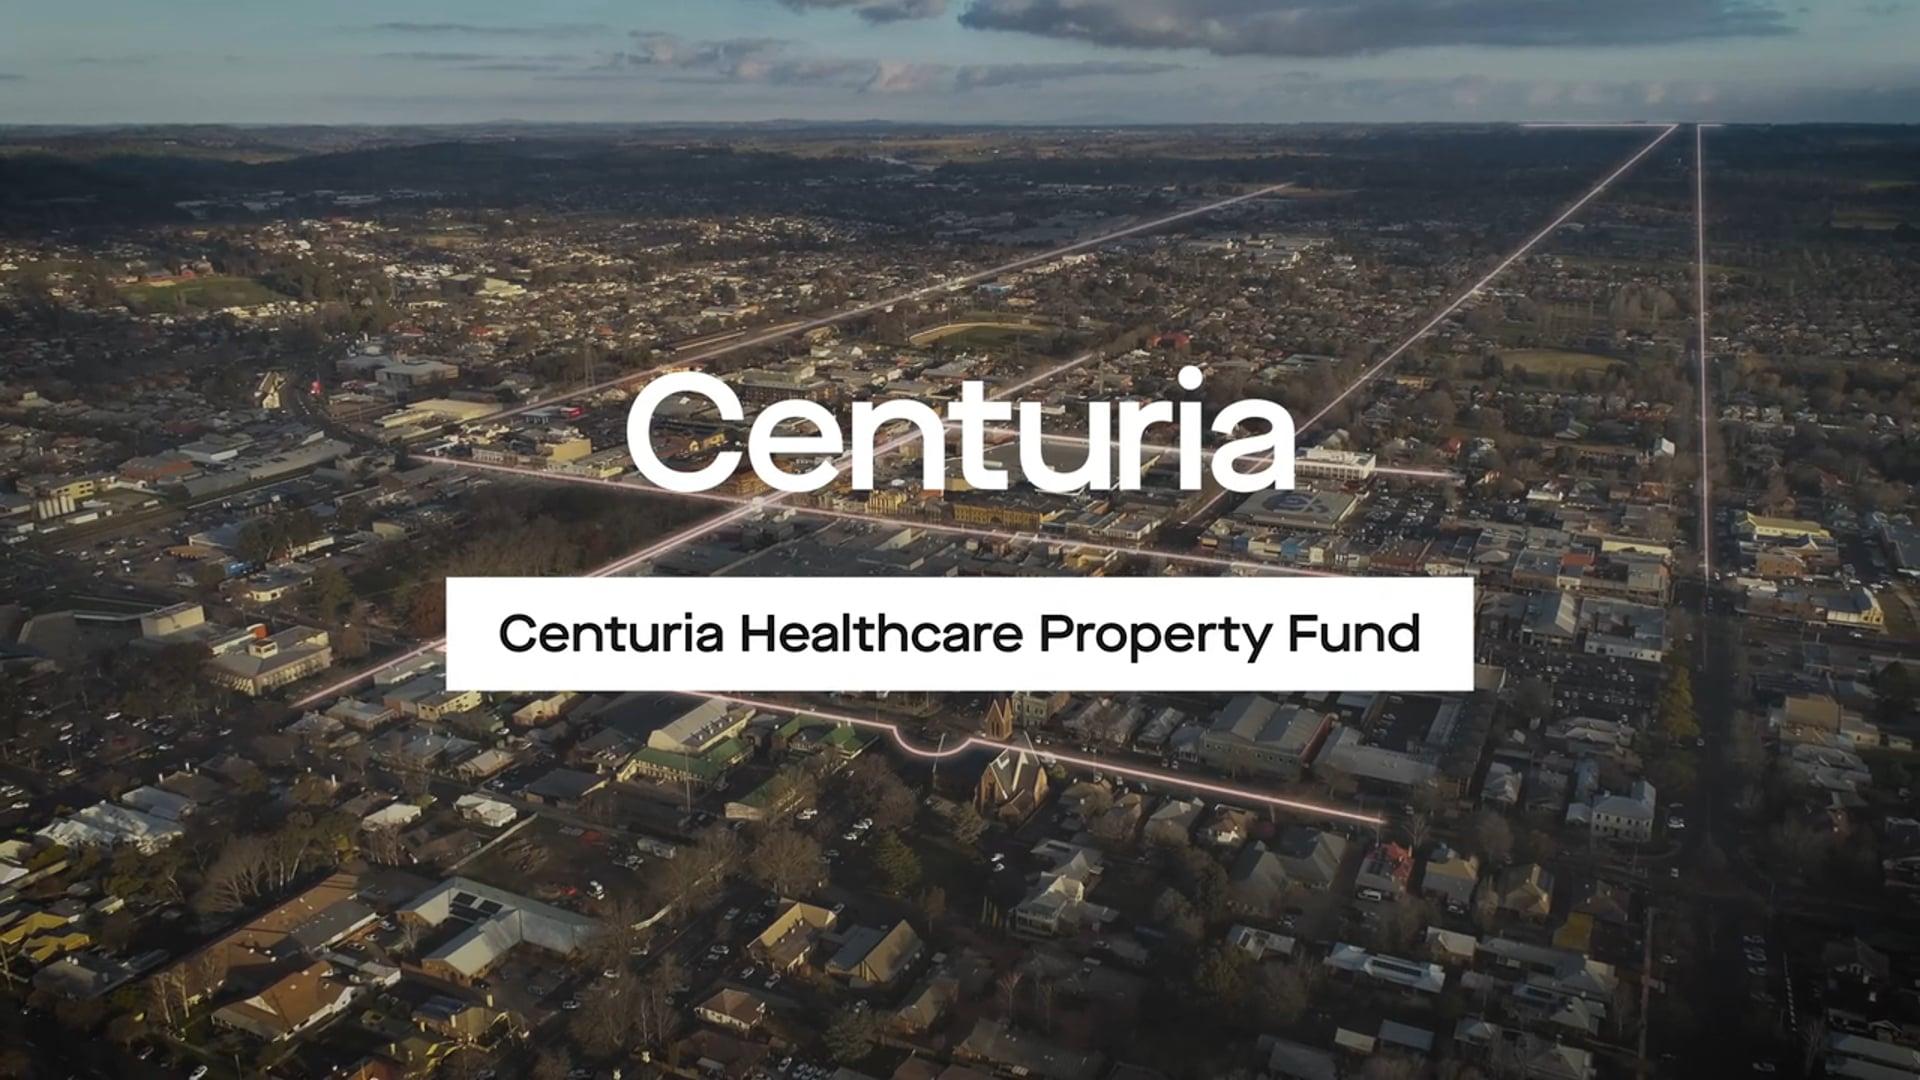 Centuria - Centuria Healthcare Property Fund